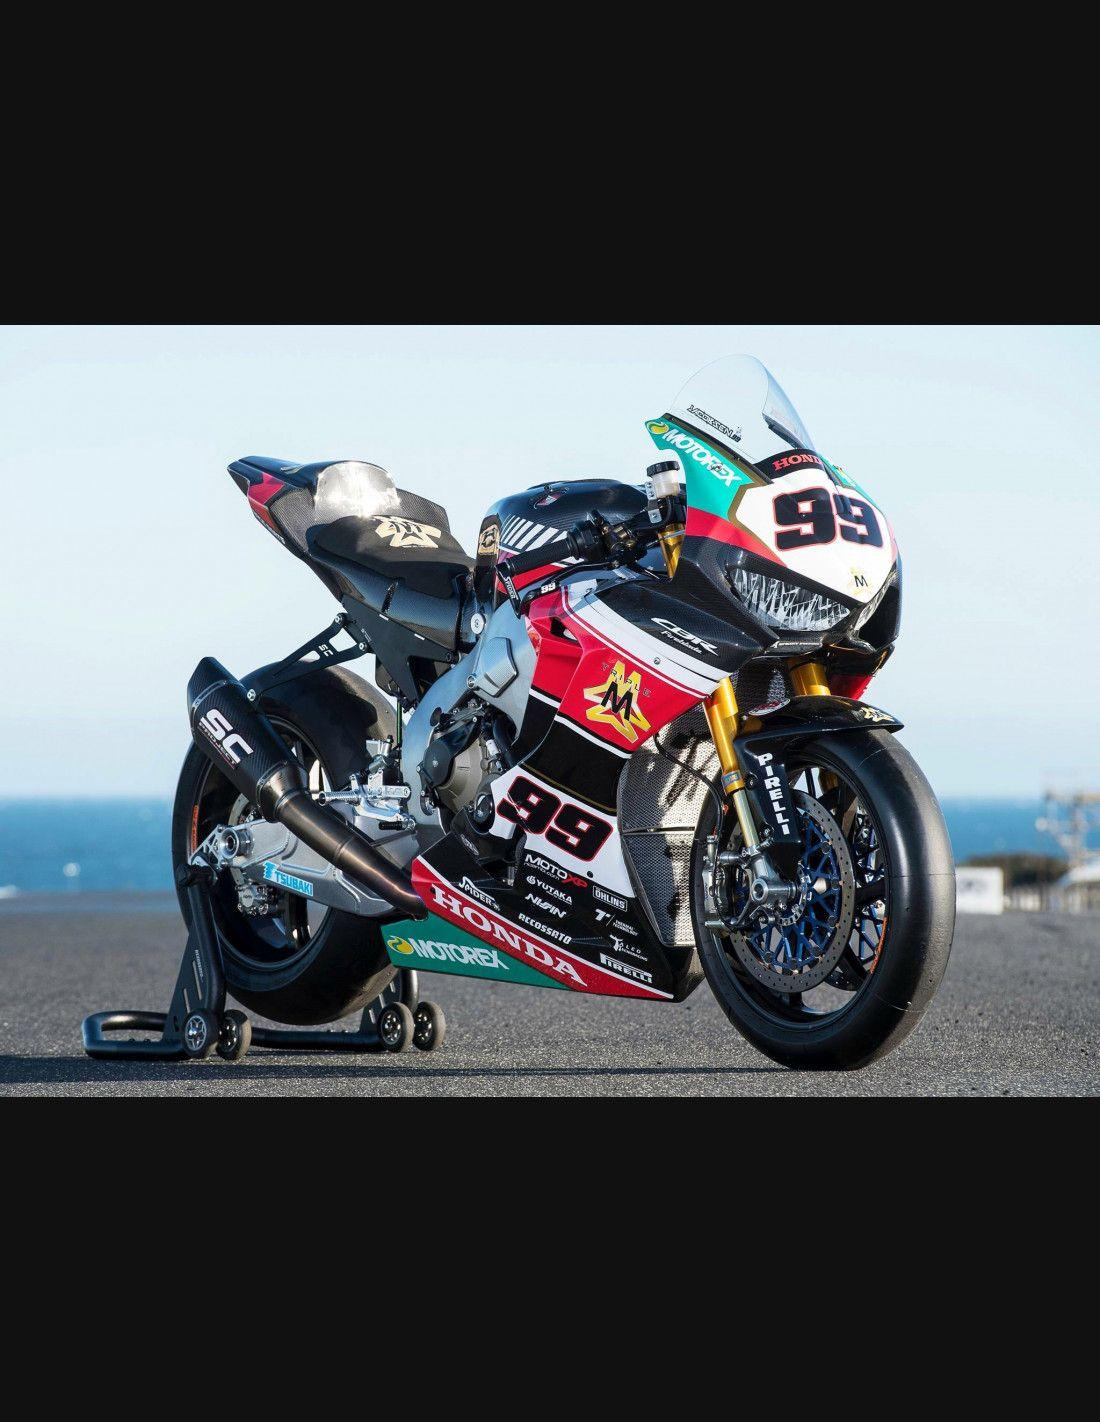 Painted Race Fairings Honda Cbr 1000 Rr 2017 2019 Mxpcrv7292 In 2020 Honda Cbr Racing Bikes Cbr